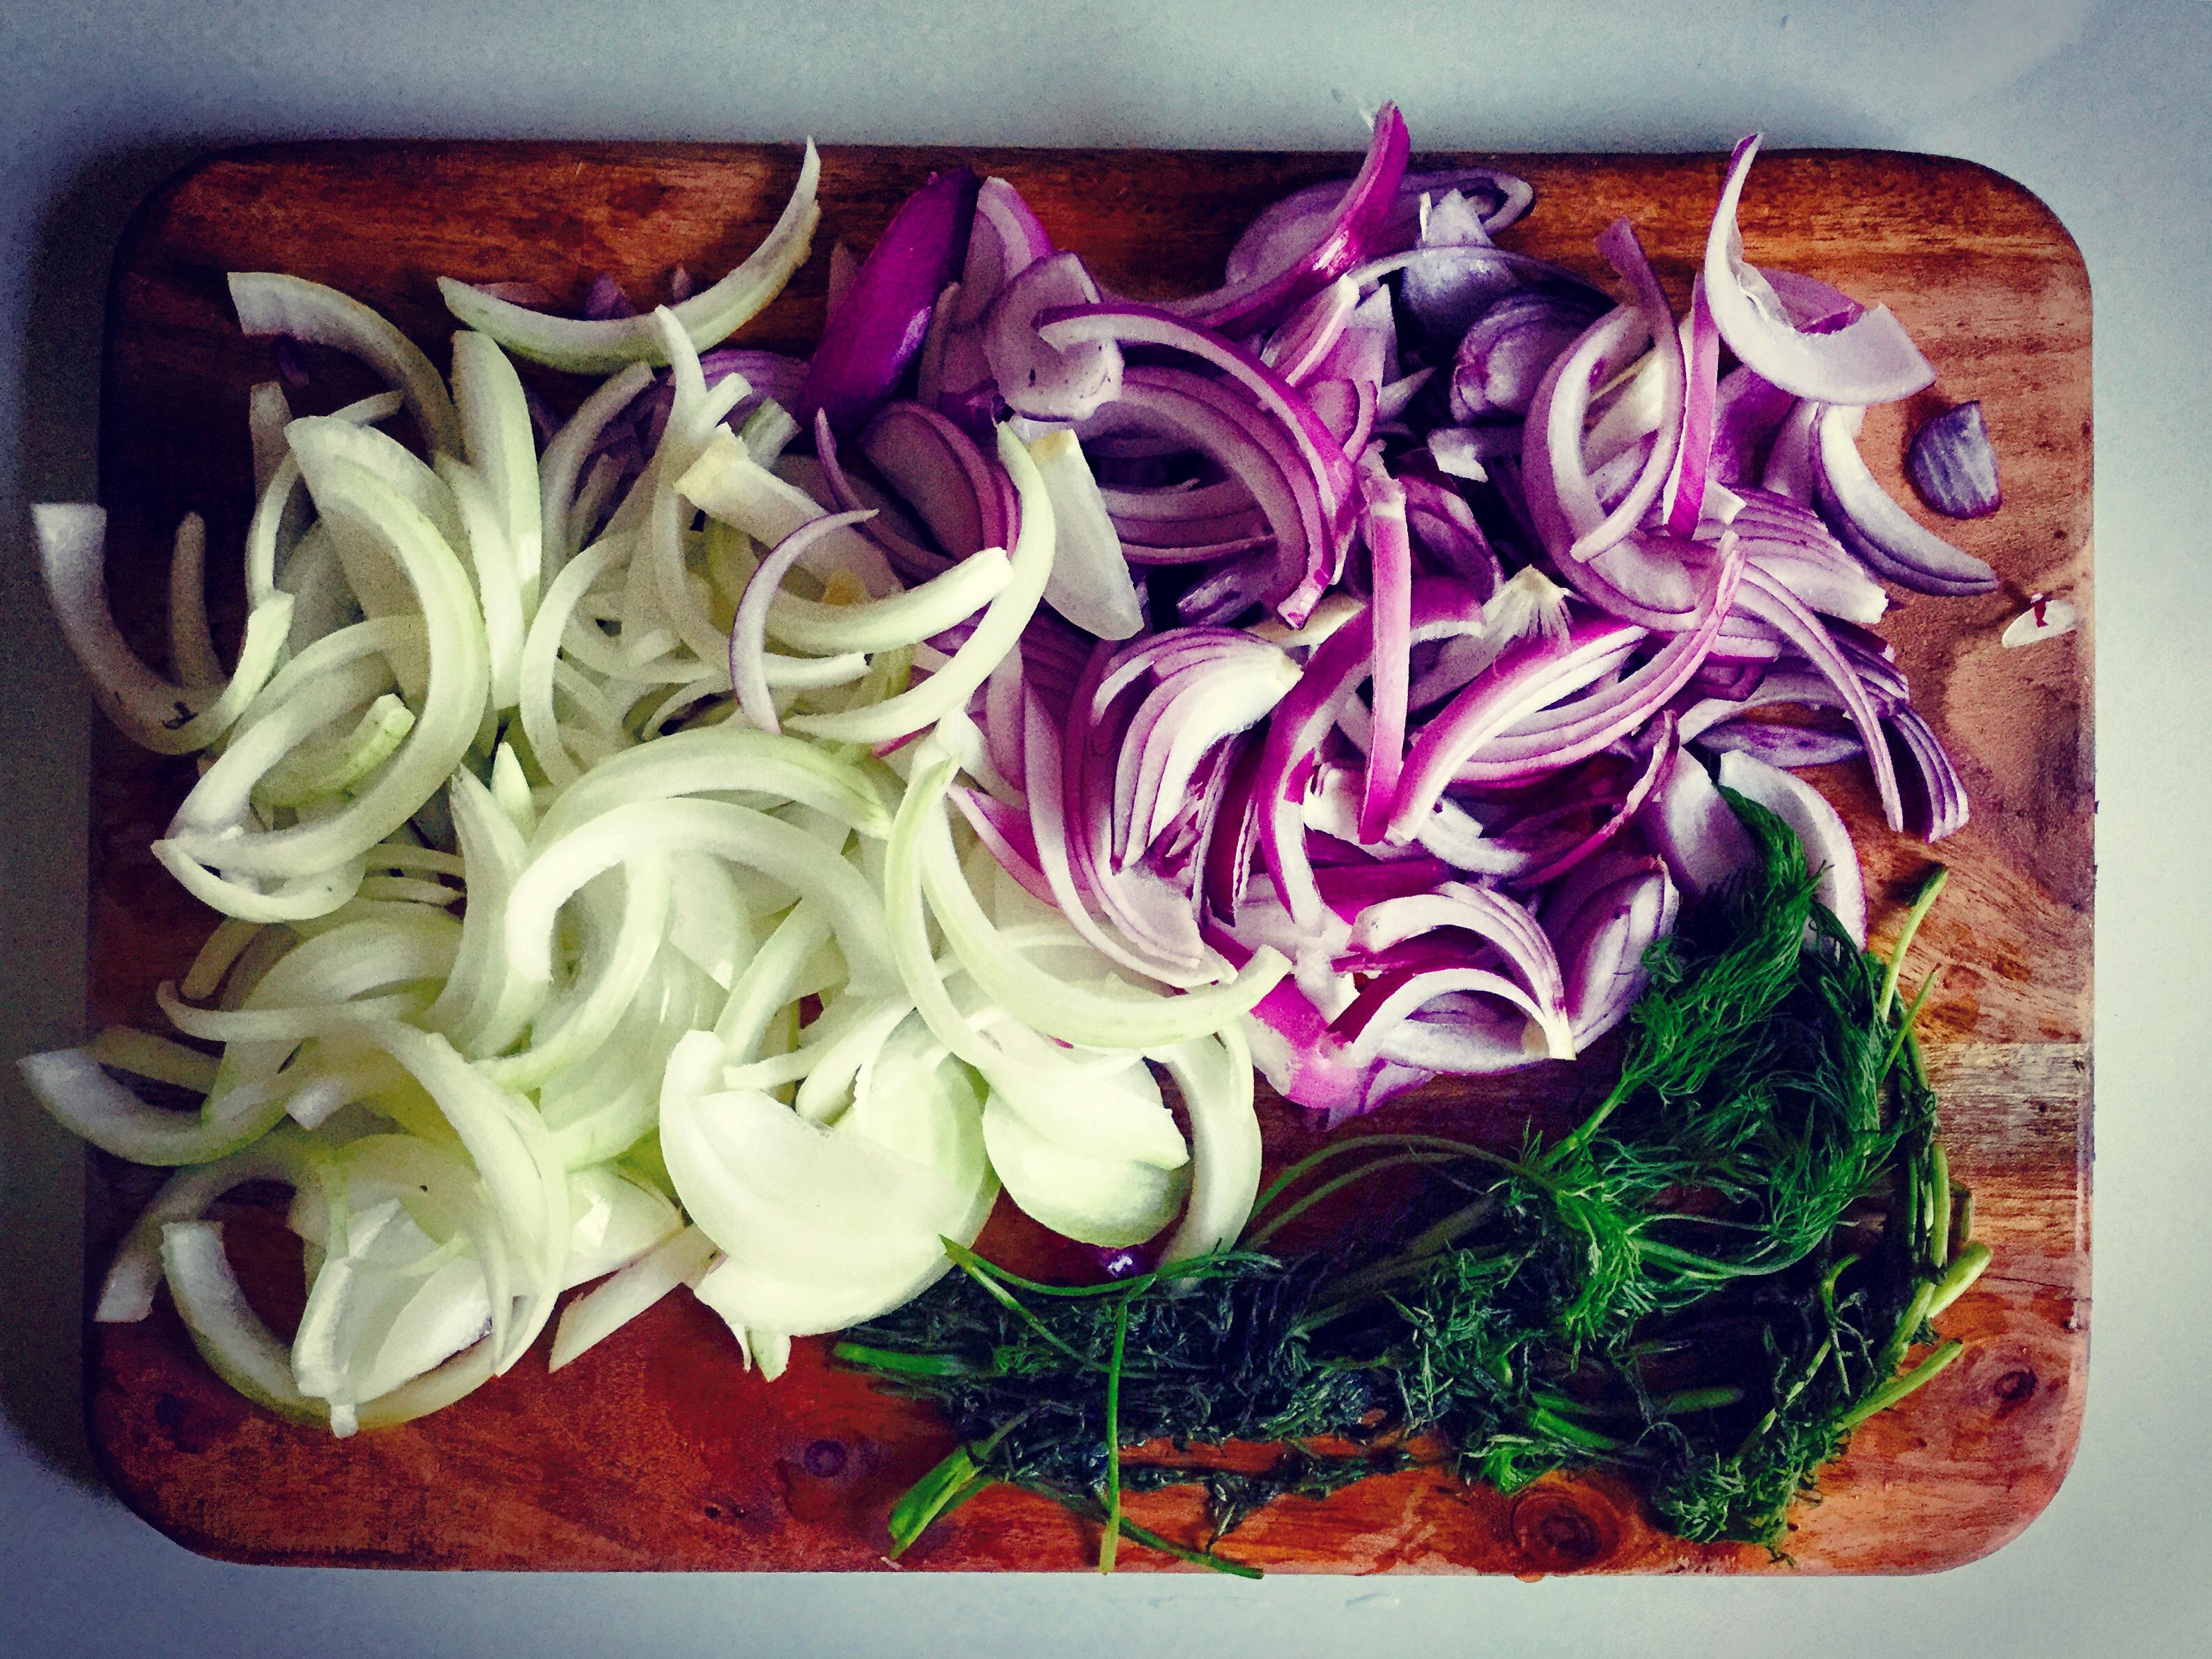 onion dill